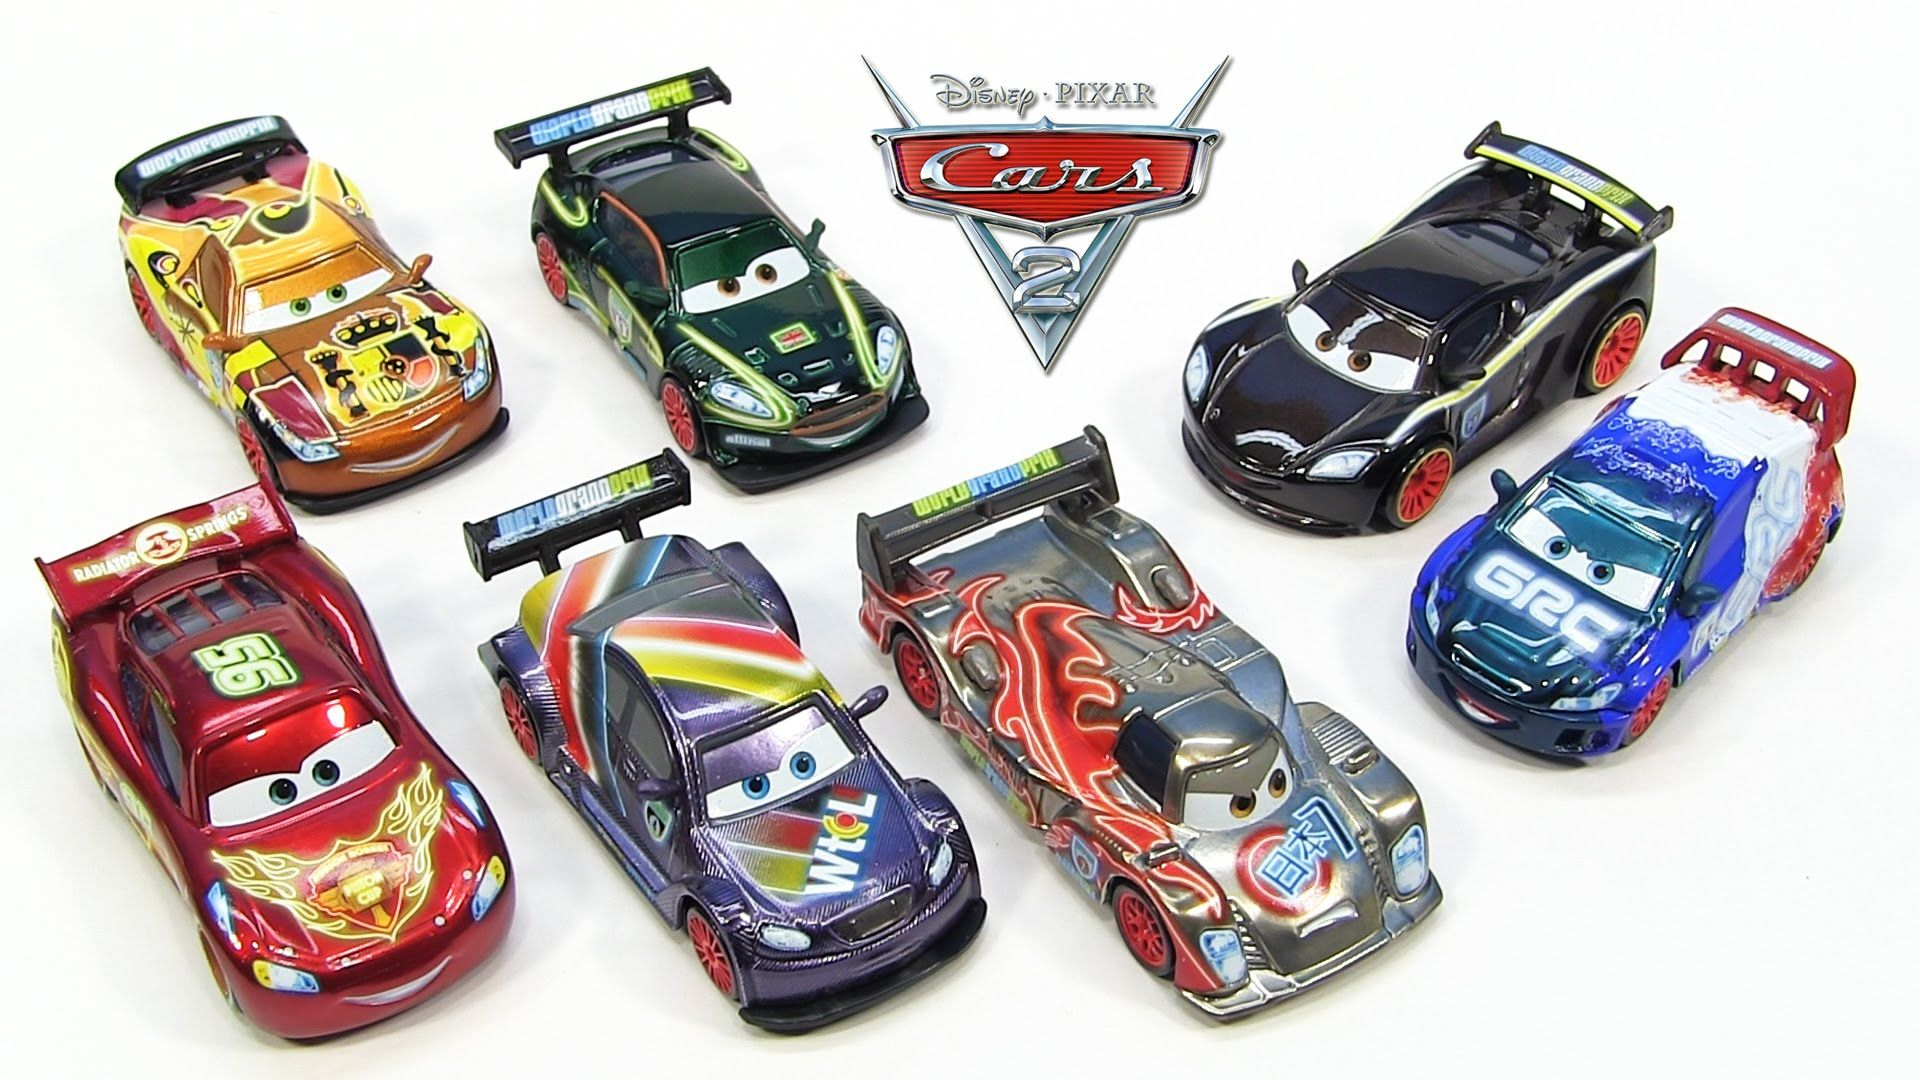 Disney Cars 2 Neon Racers Metallic Finish Lightning Mcqueen Shu